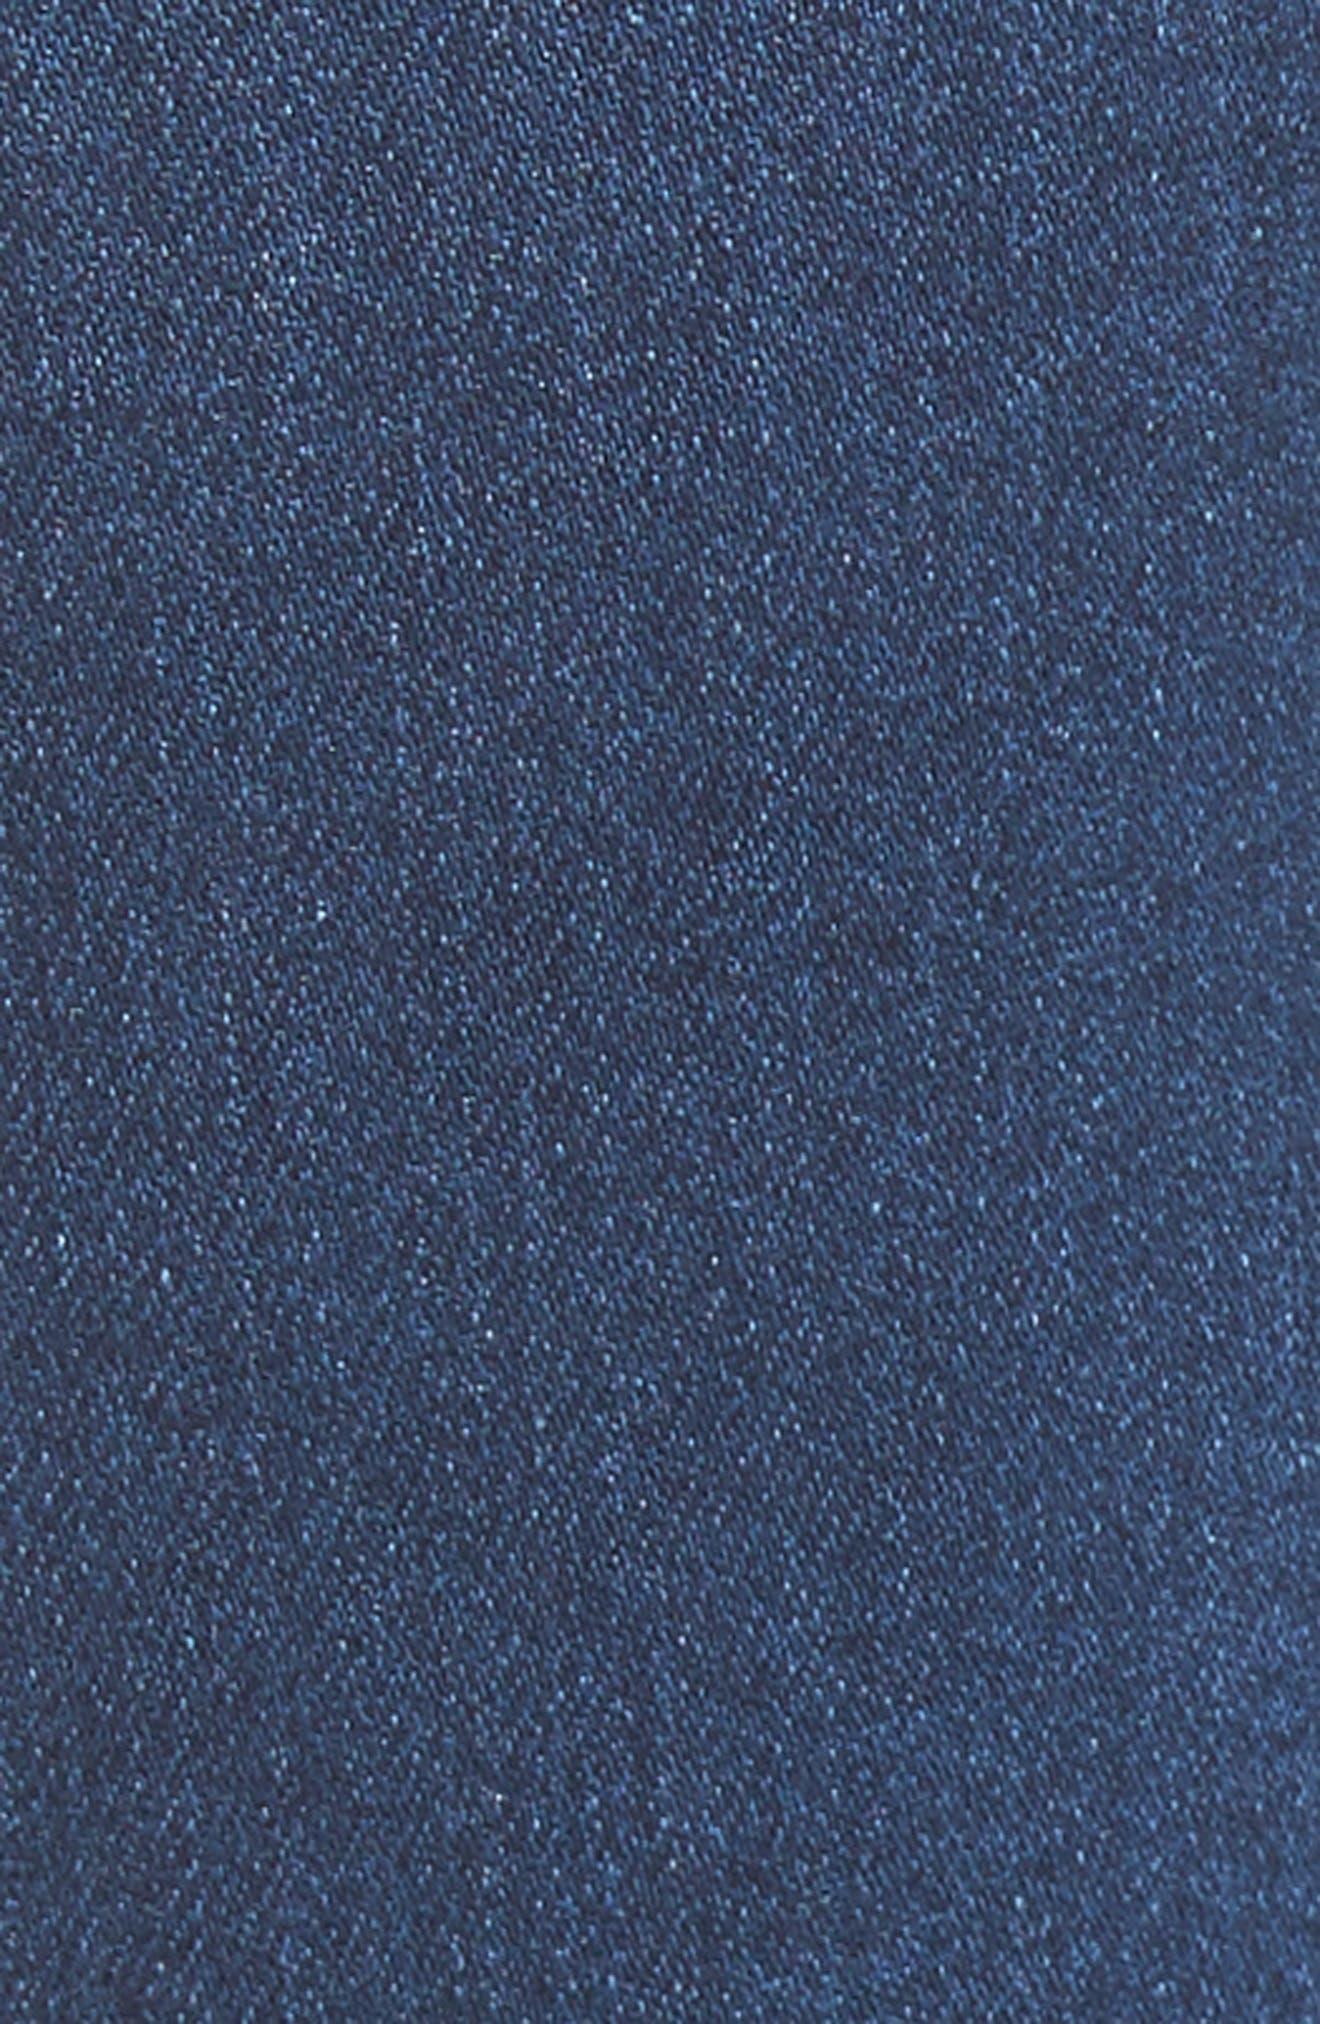 Ruffle Hem Jeans,                             Alternate thumbnail 5, color,                             Med Wash